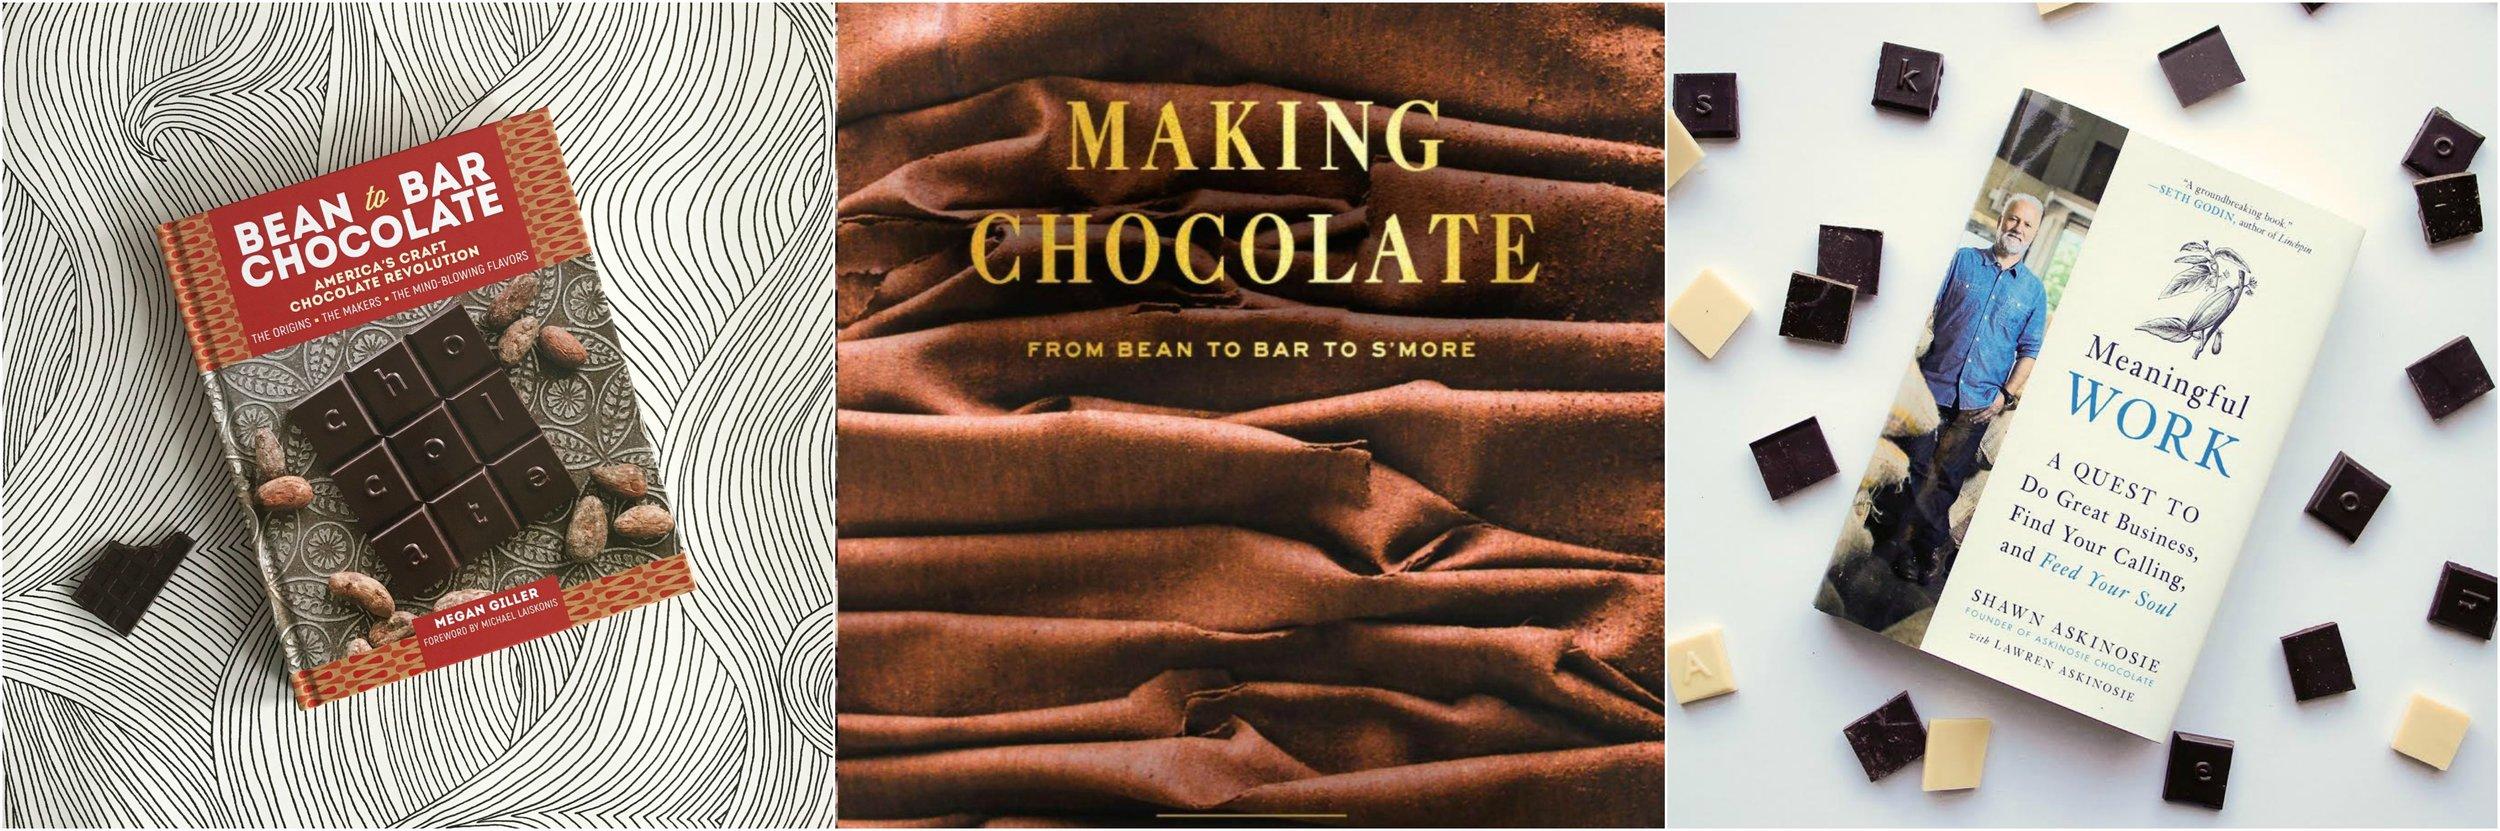 ChocolateBooksCollage.jpg